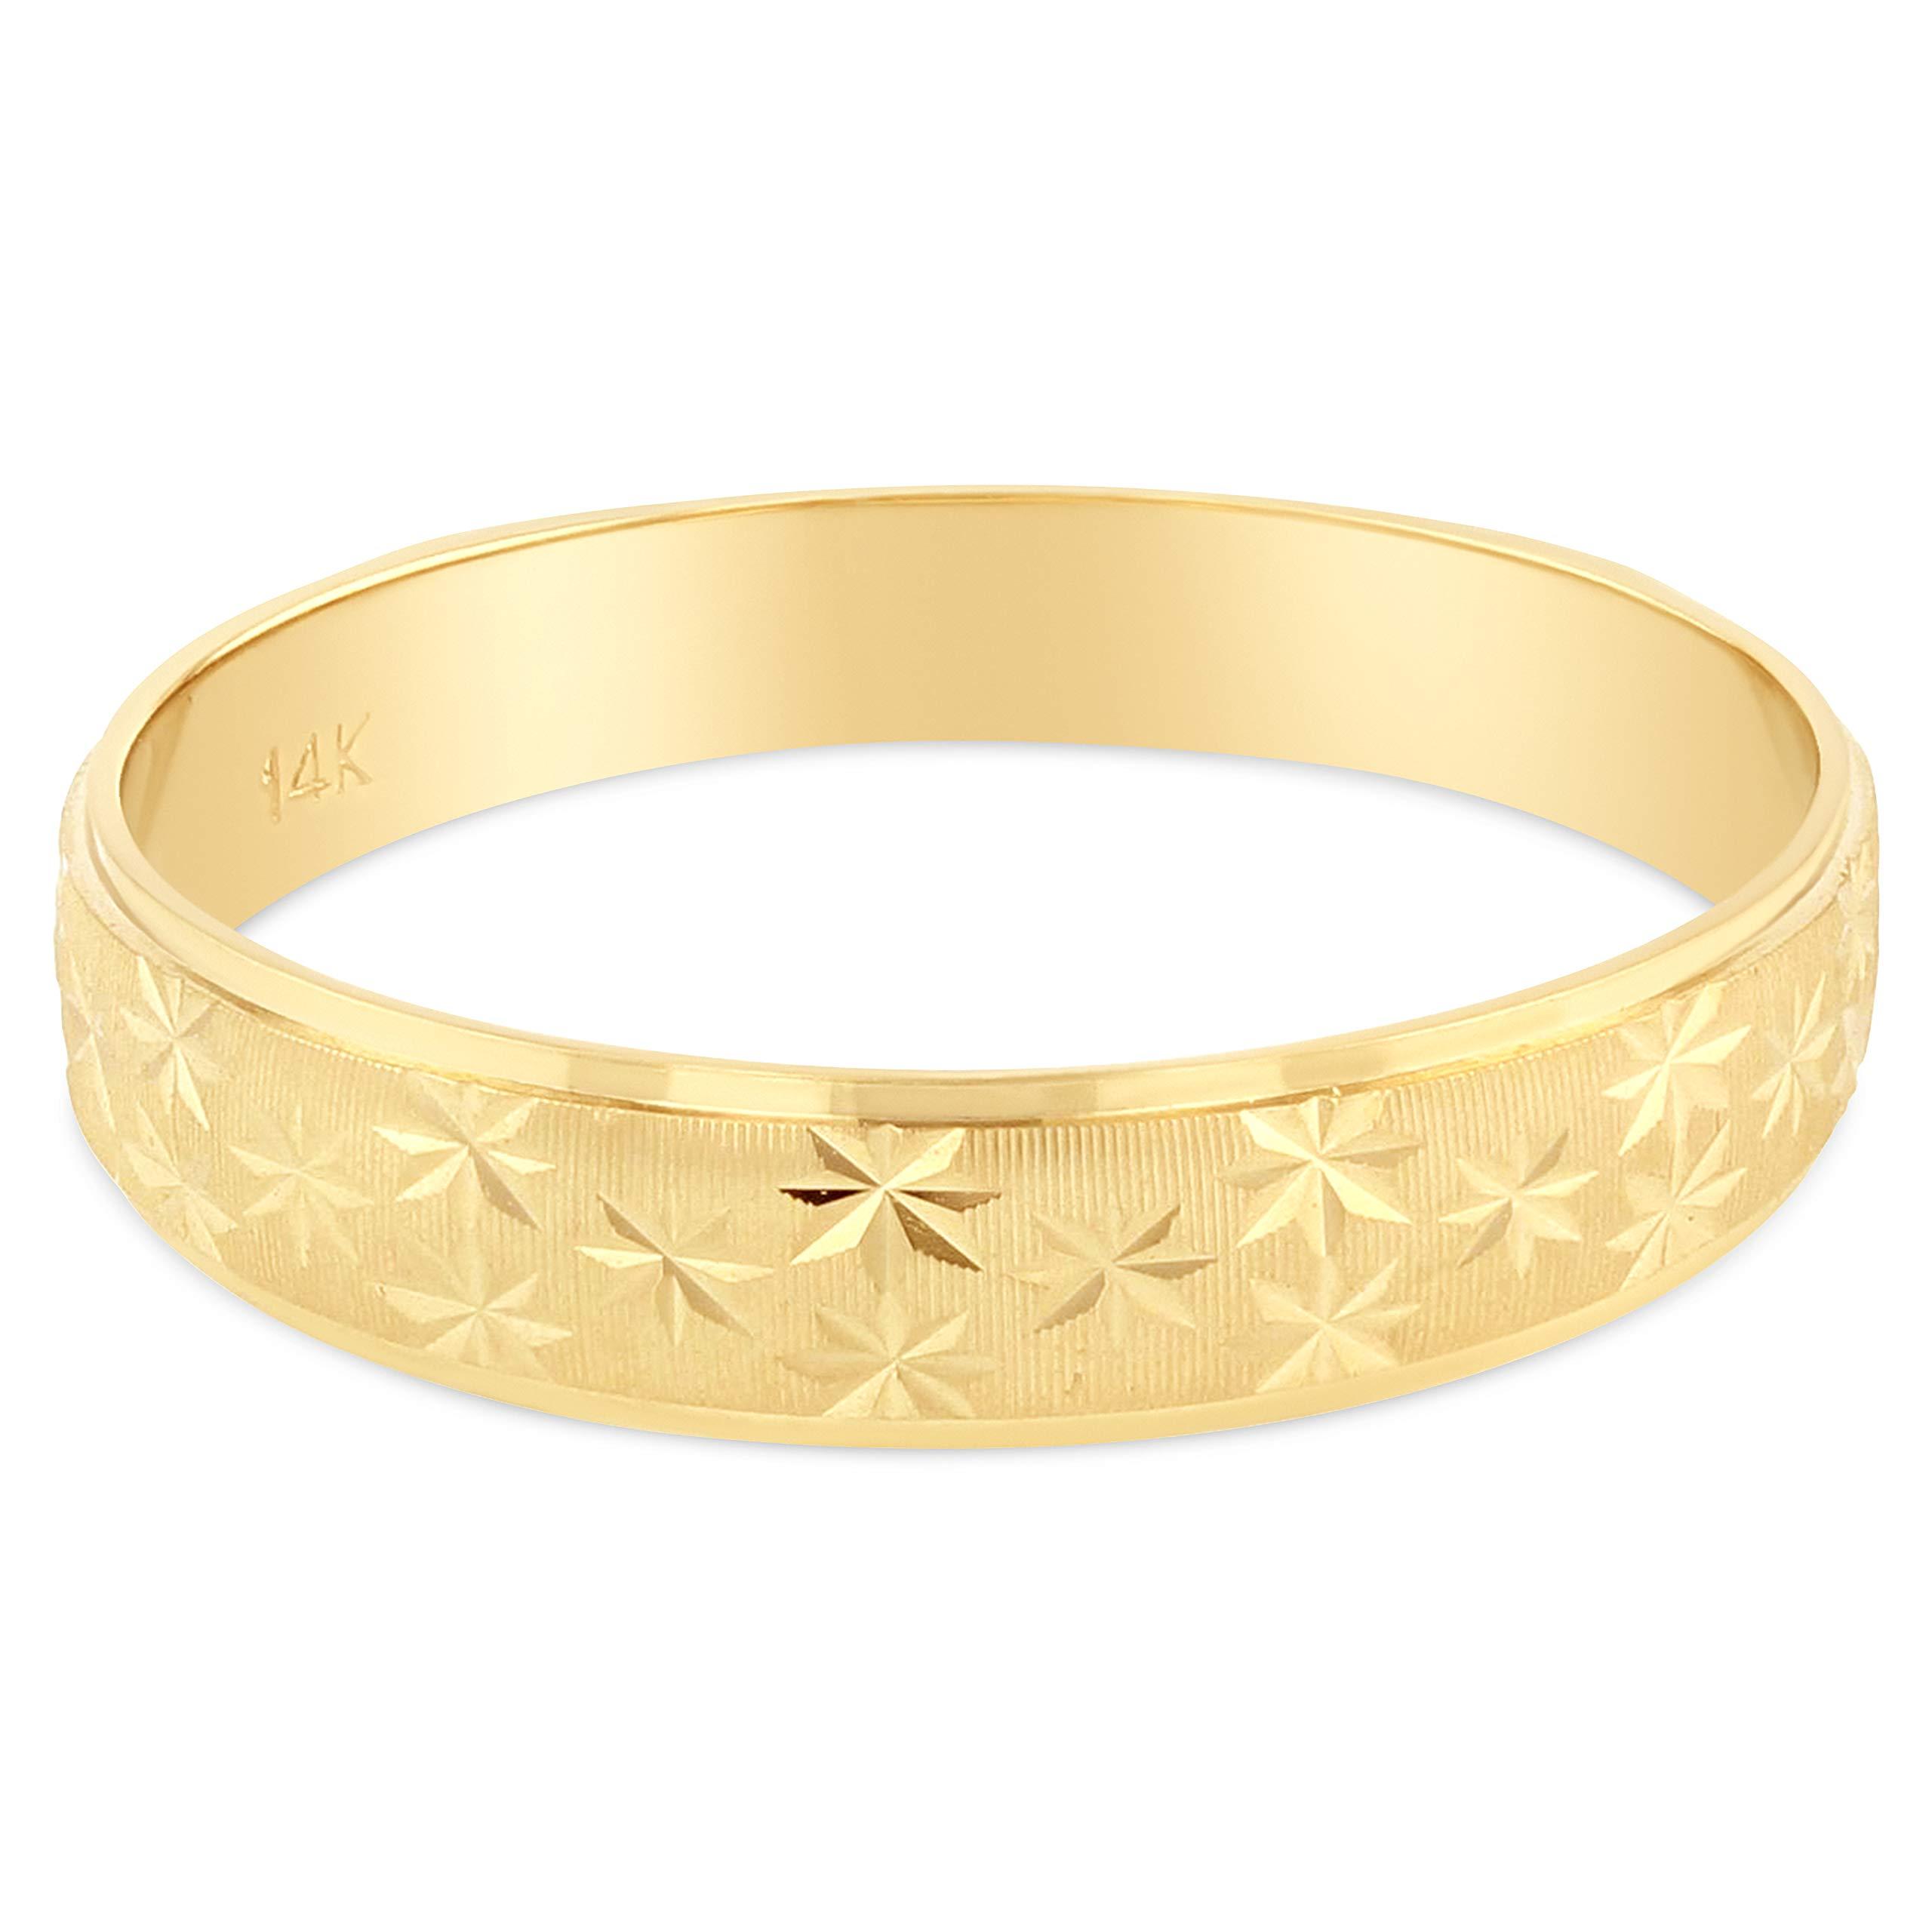 Ioka - 14K Solid Yellow Gold 4mm Diamond Cut Star Pattern Women's Wedding Band - Size 7.5 by Ioka